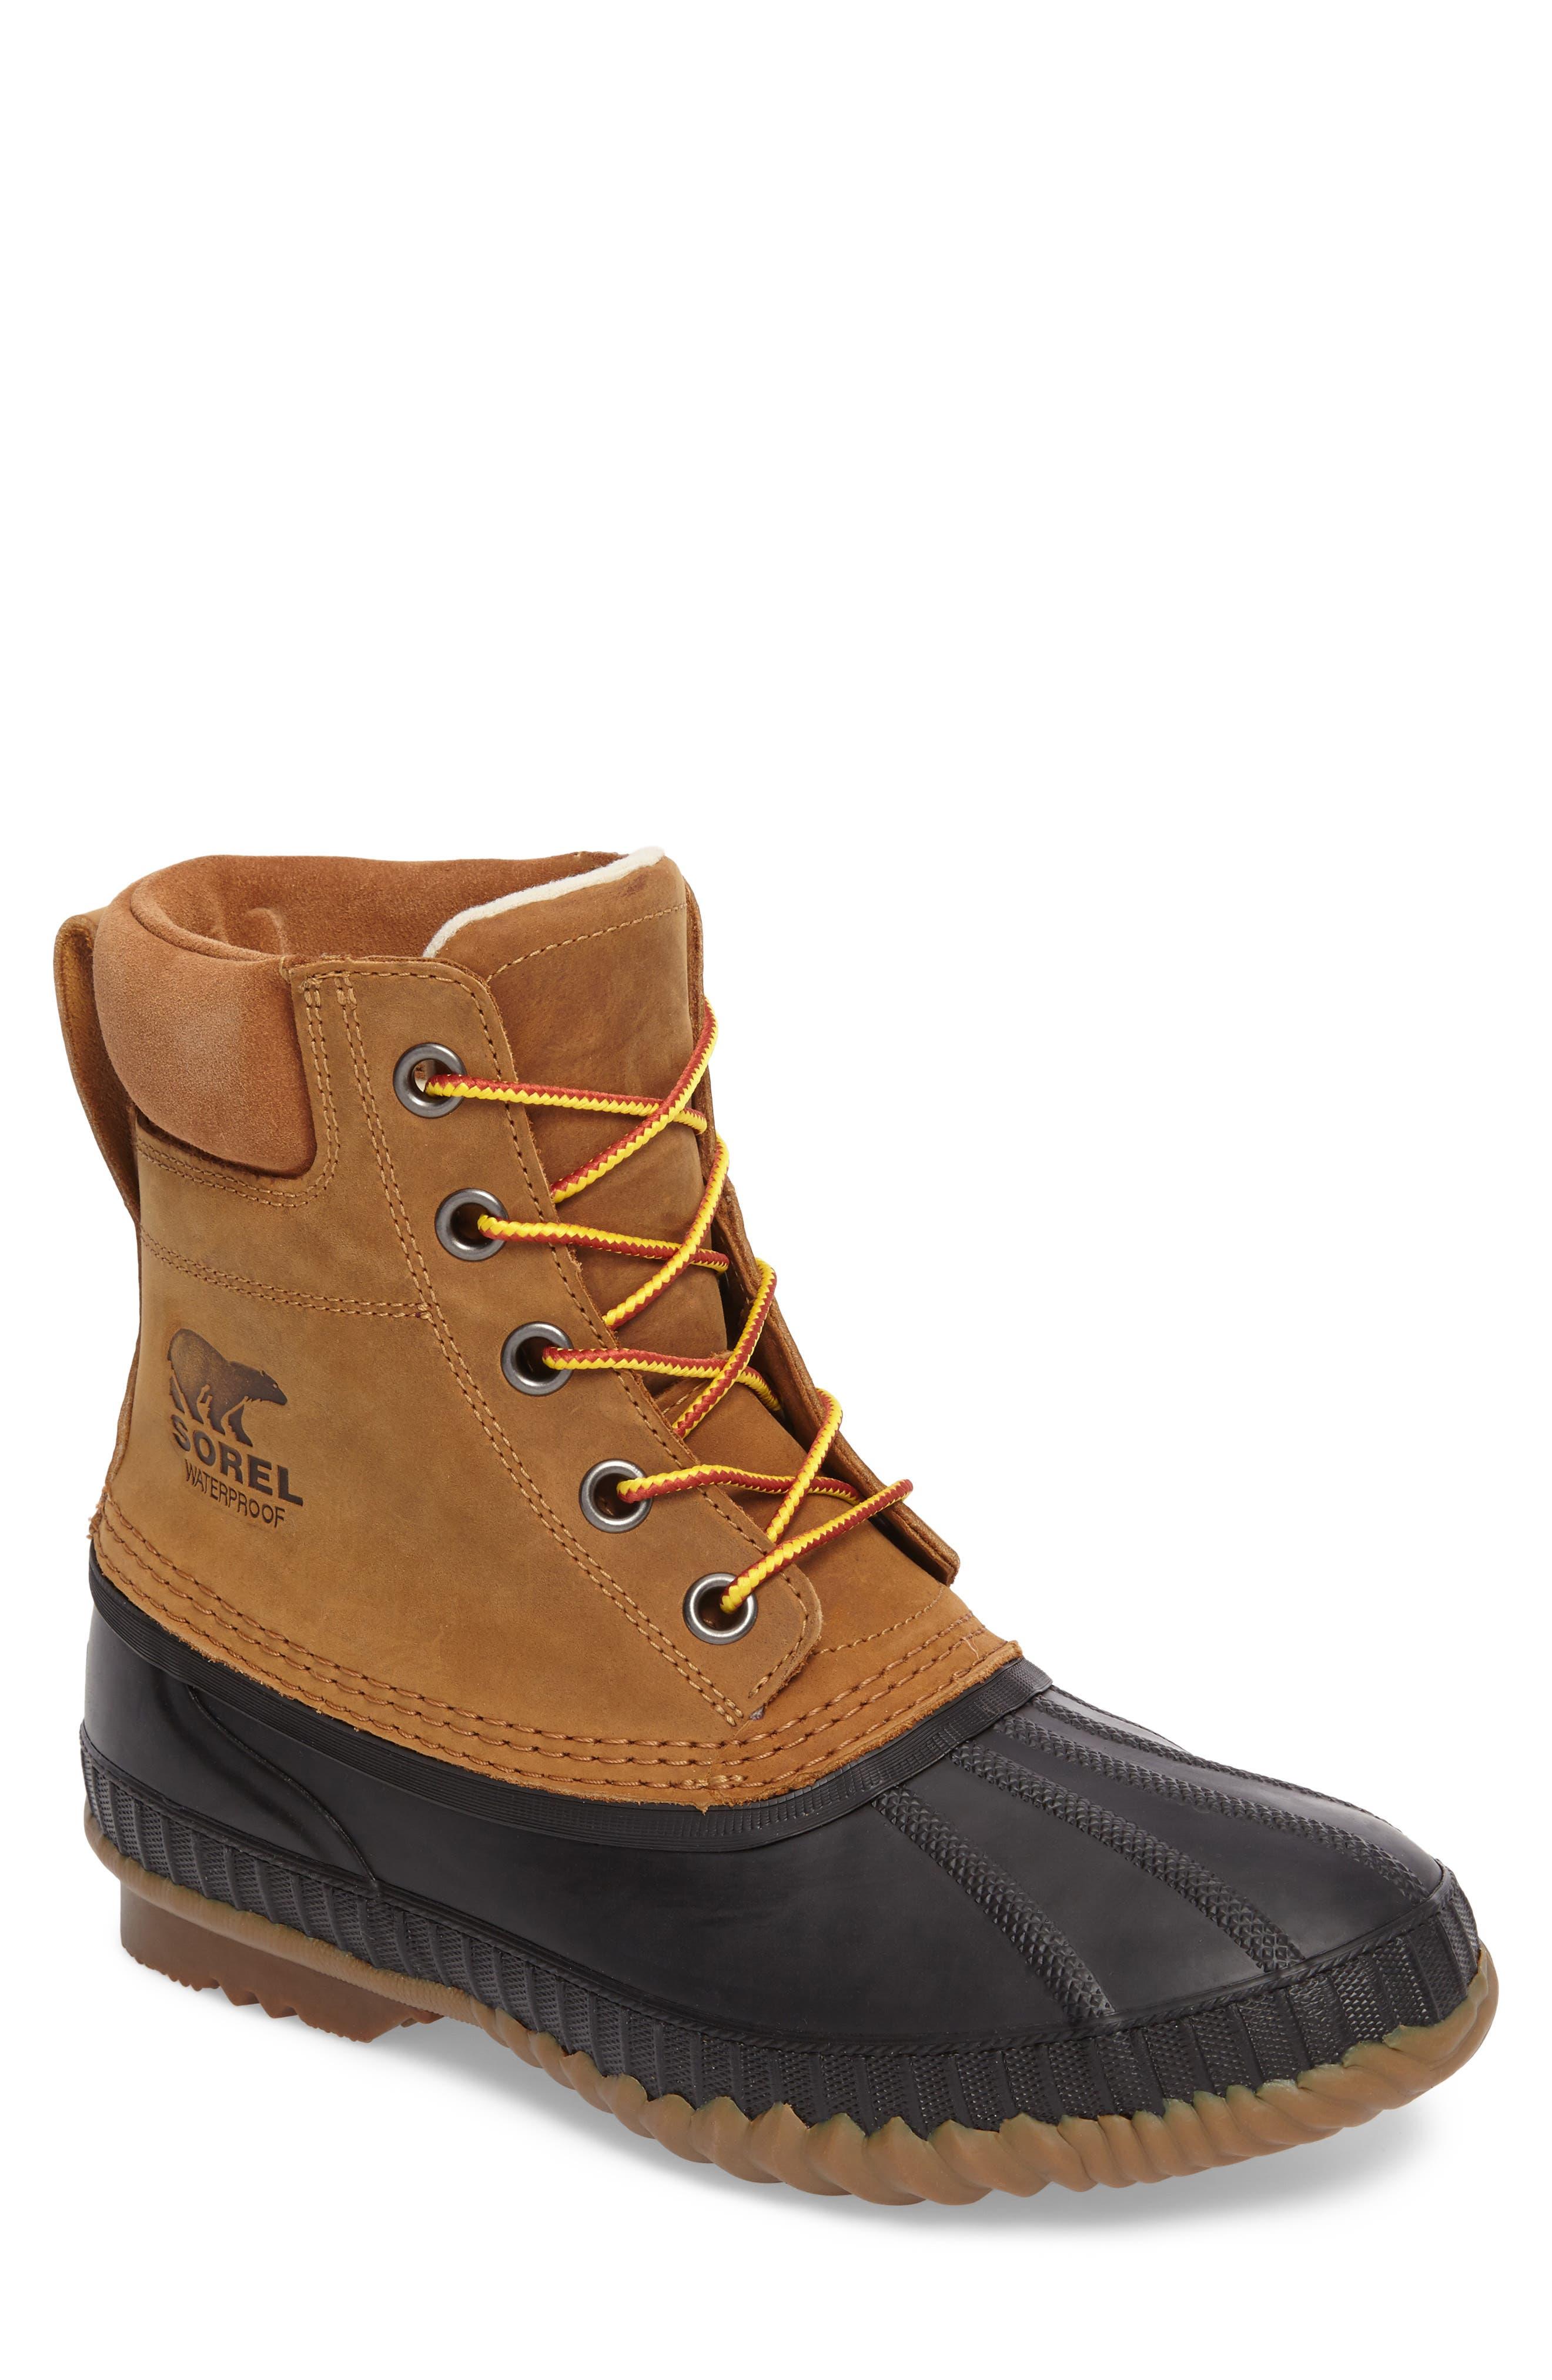 Main Image - Sorel Cheyanne II Waterpoof Boot (Men)